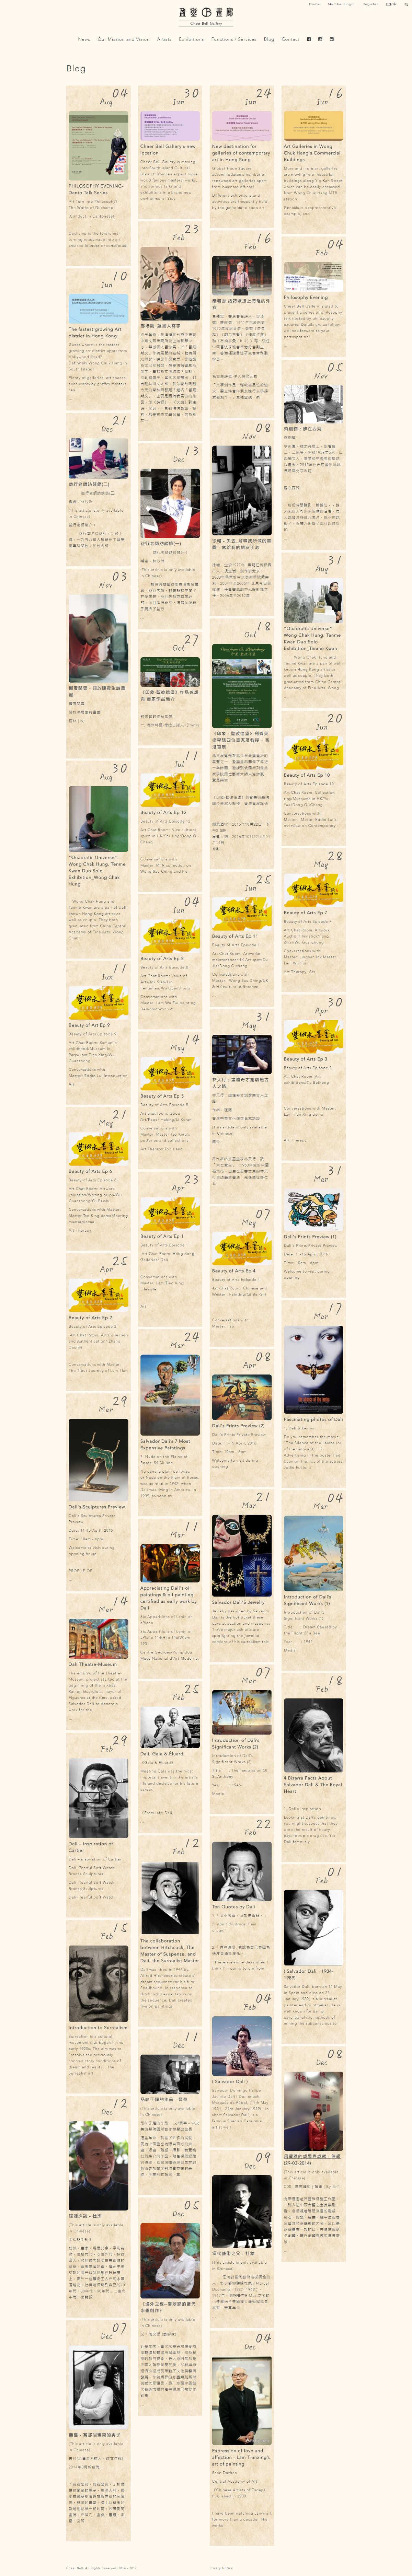 Cheer Bell Gallery Website Development | Blog